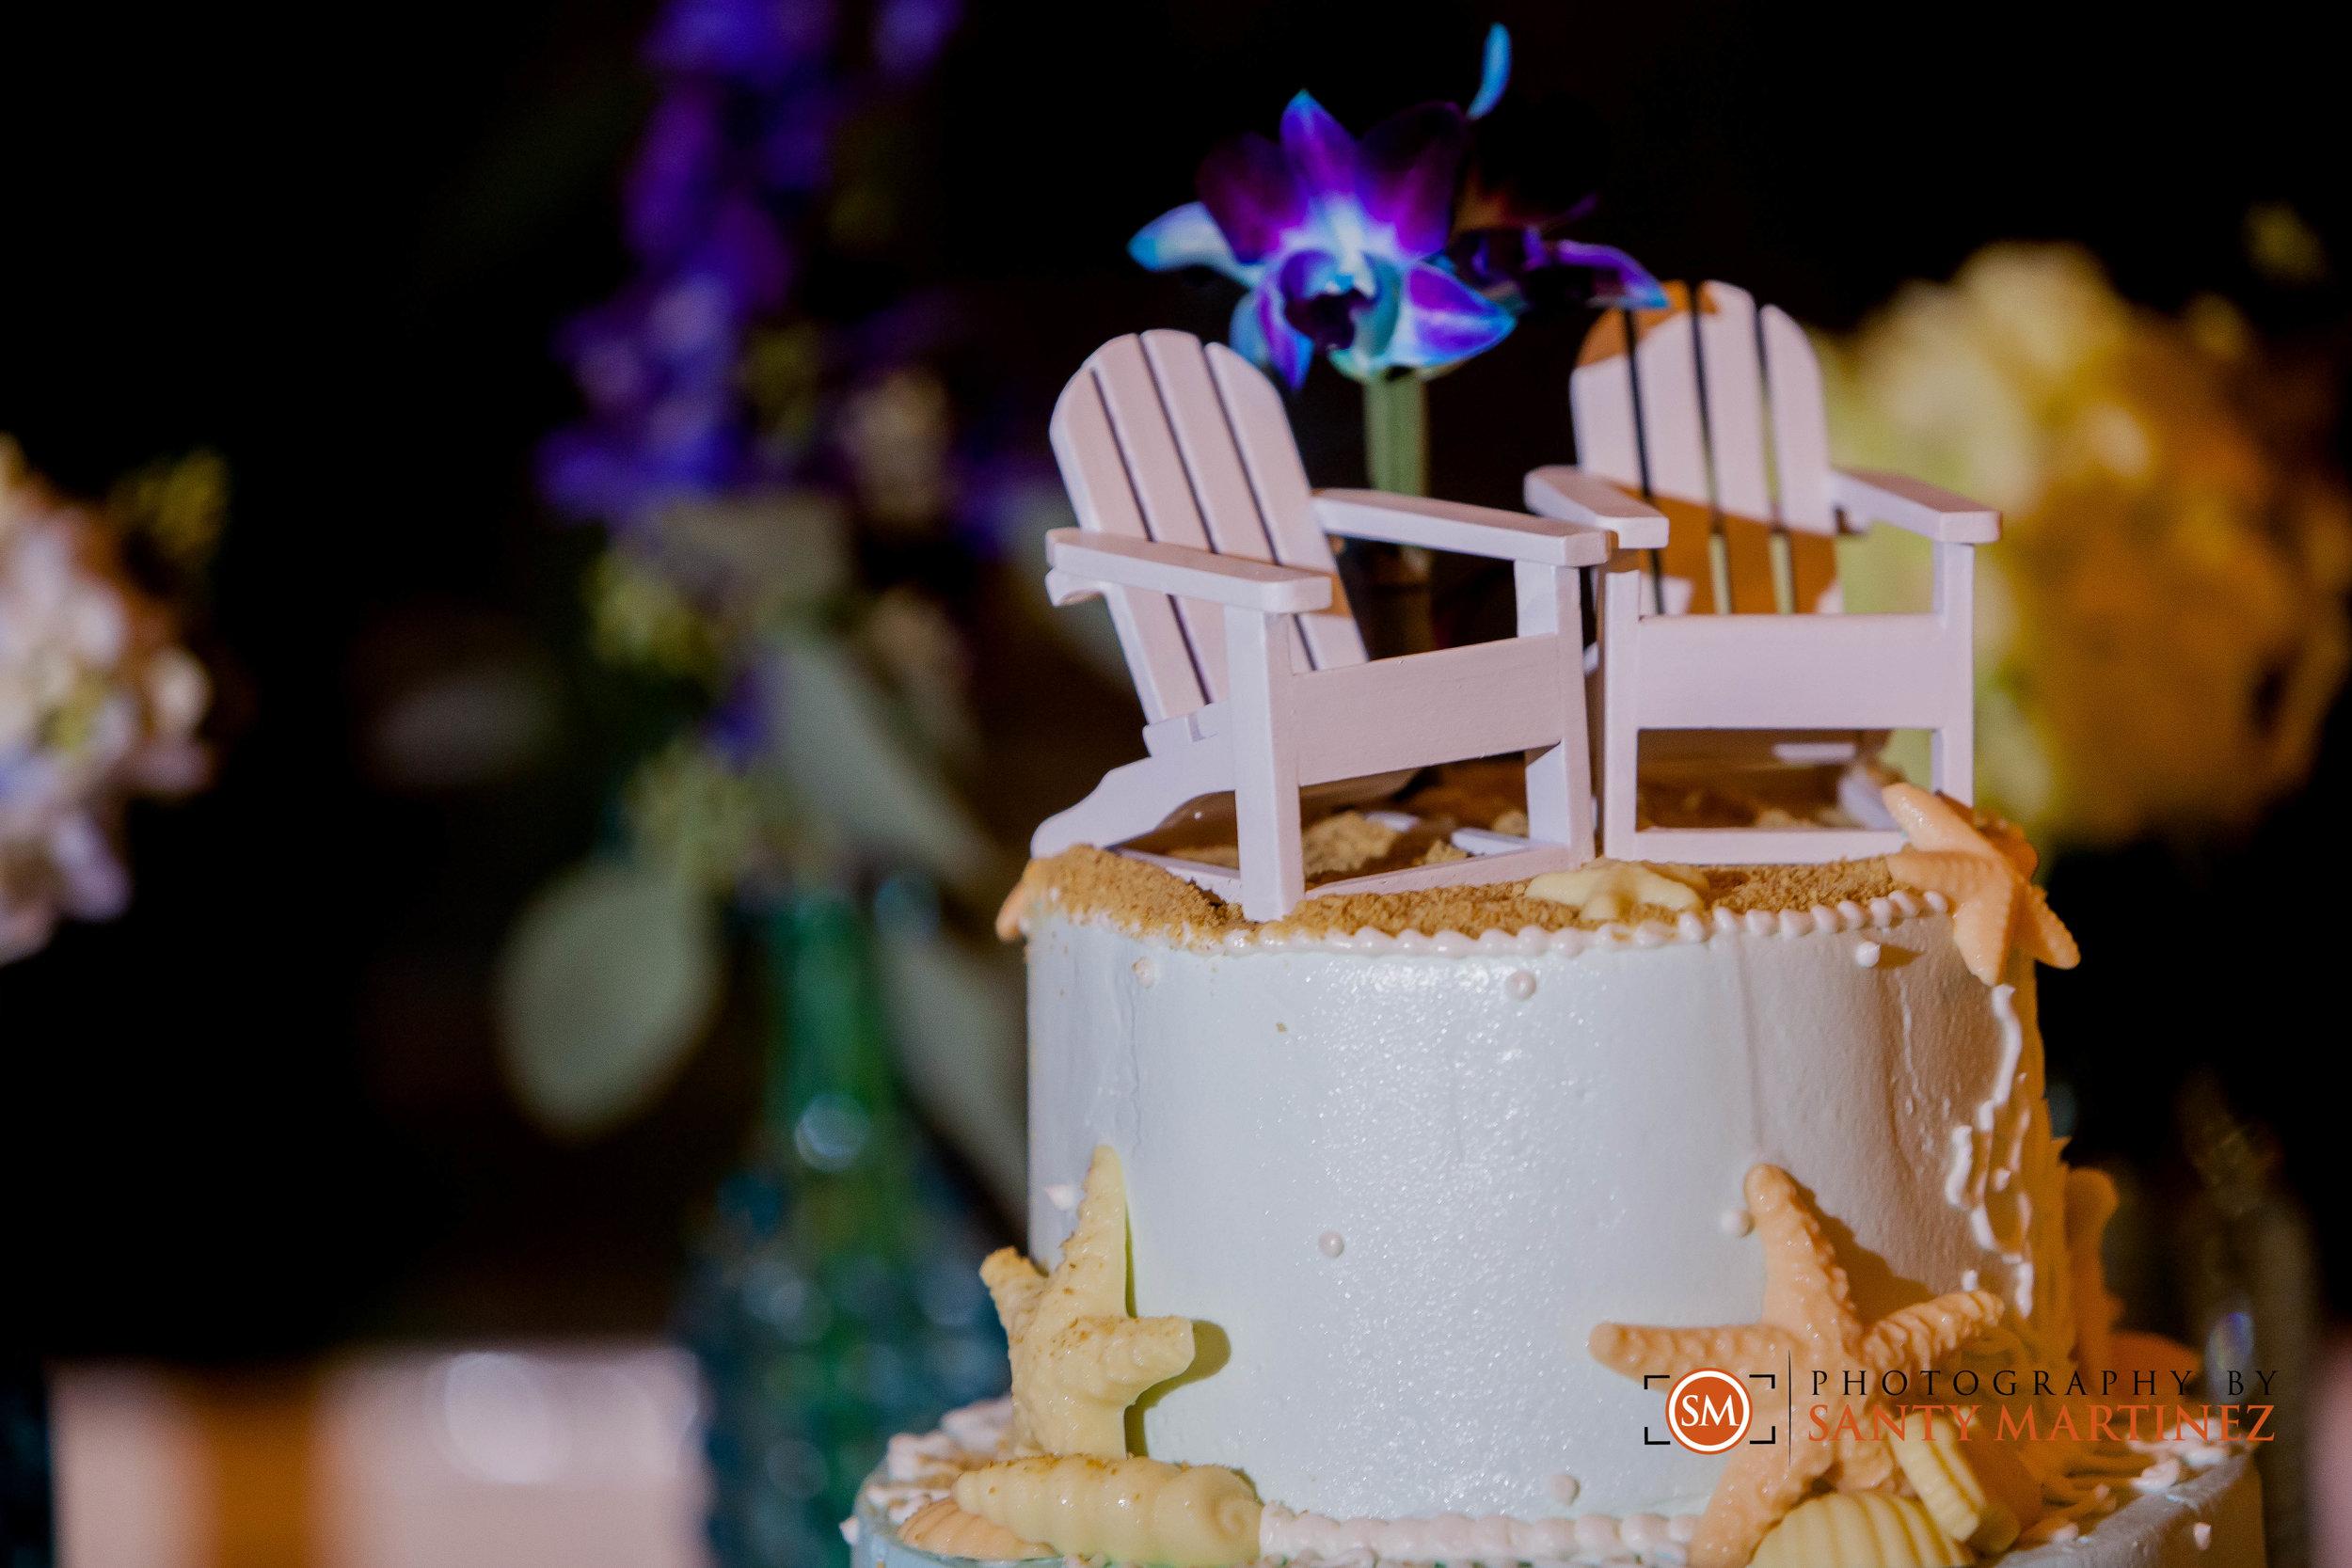 Photography by Santy Martinez - Miami Wedding Photographer-050.jpg